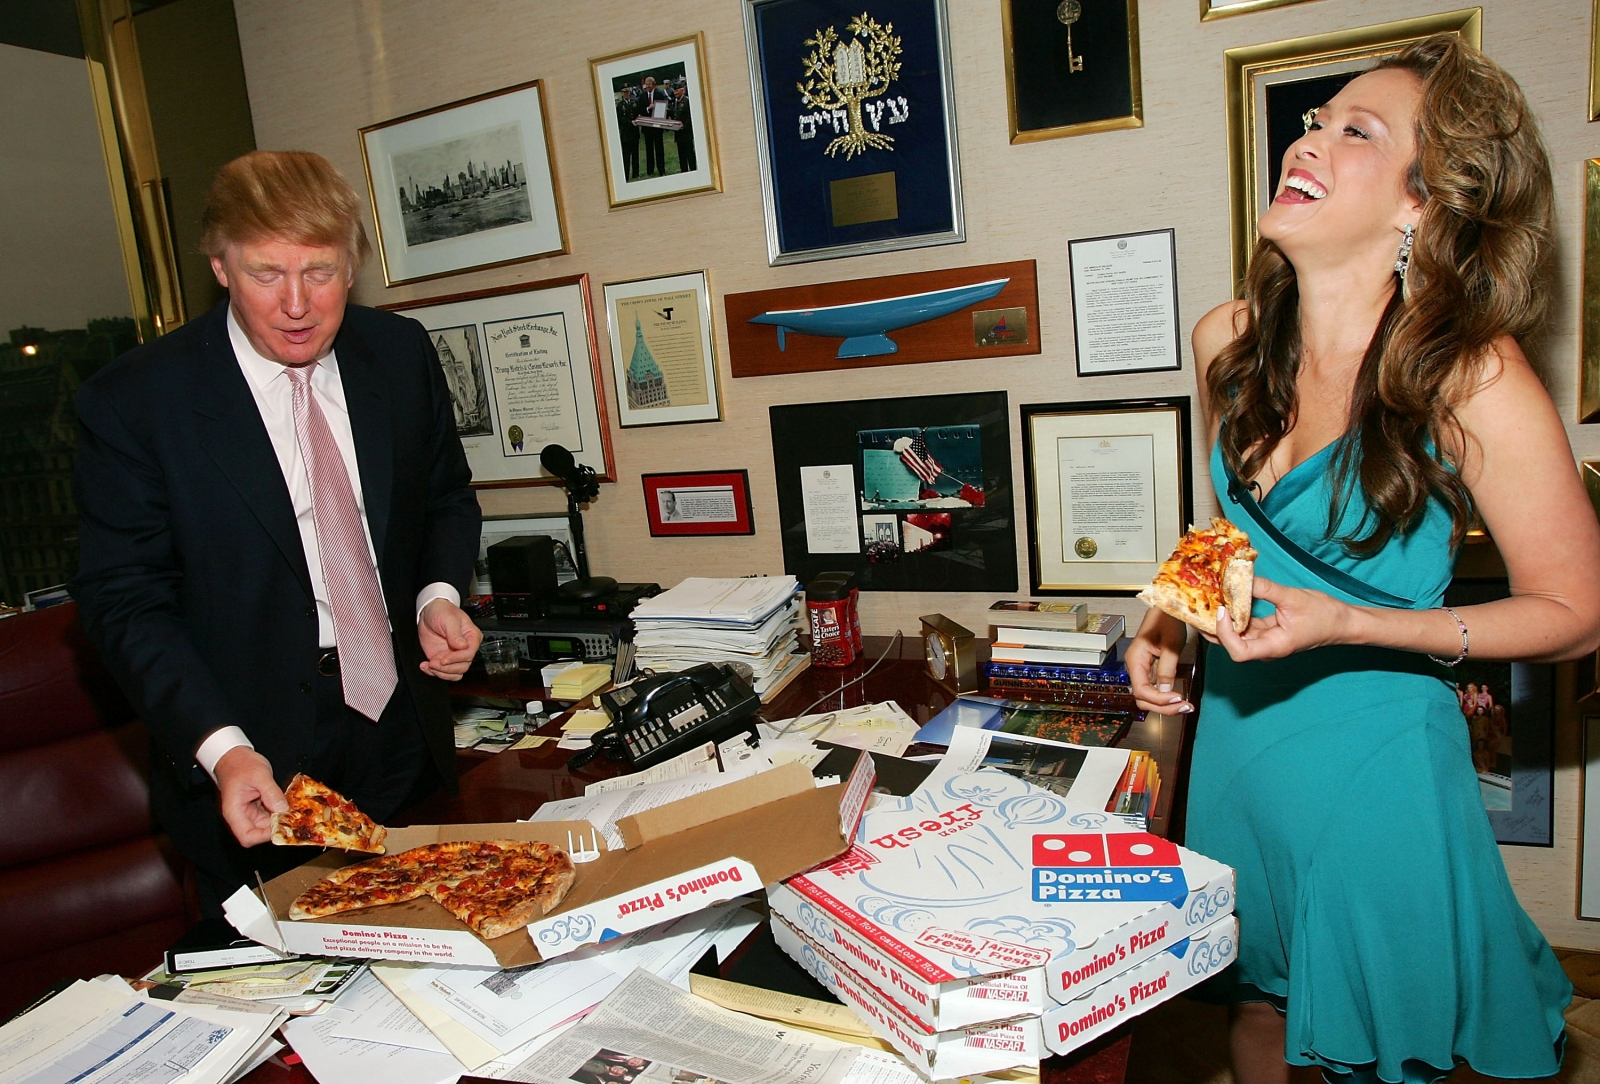 Donald Trump eating pizza